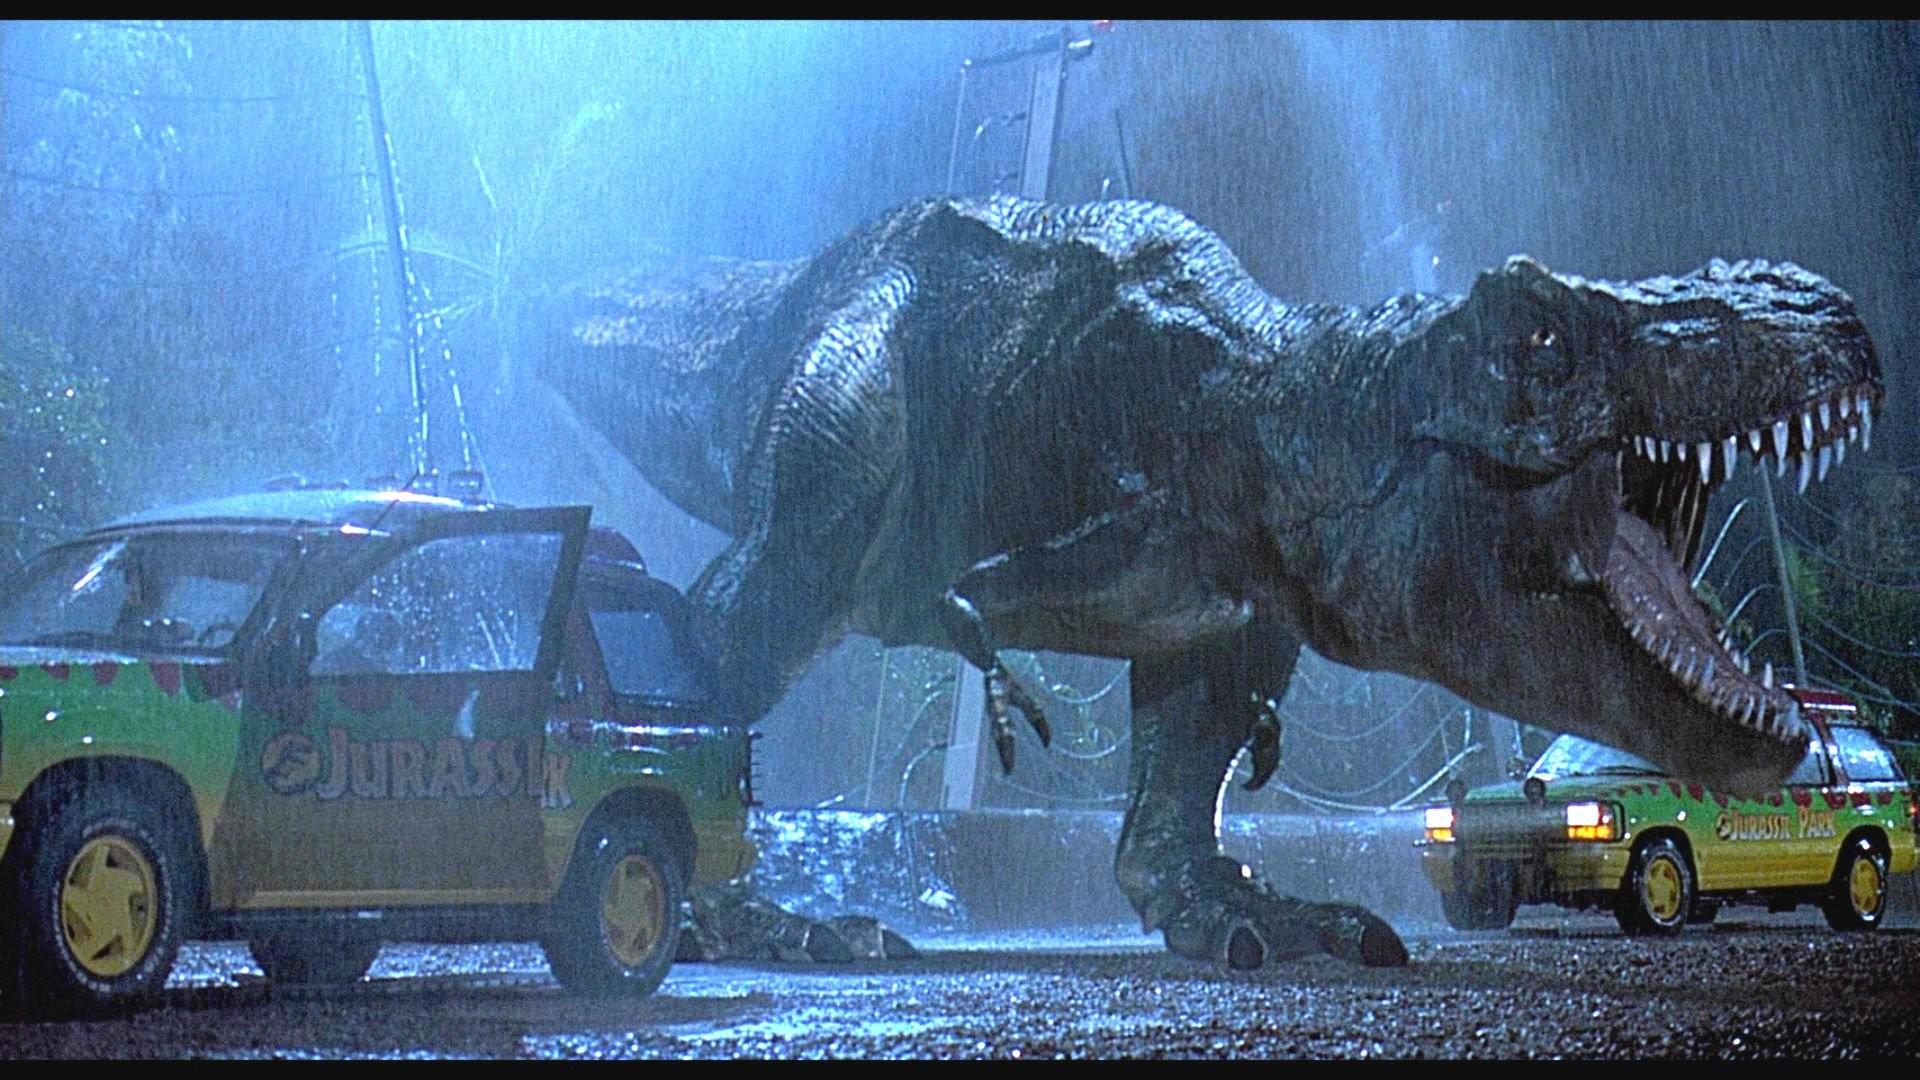 Res: 1920x1080, JURASSIC PARK adventure sci-fi fantasy dinosaur movie film rain wallpaper |   | 289297 | WallpaperUP